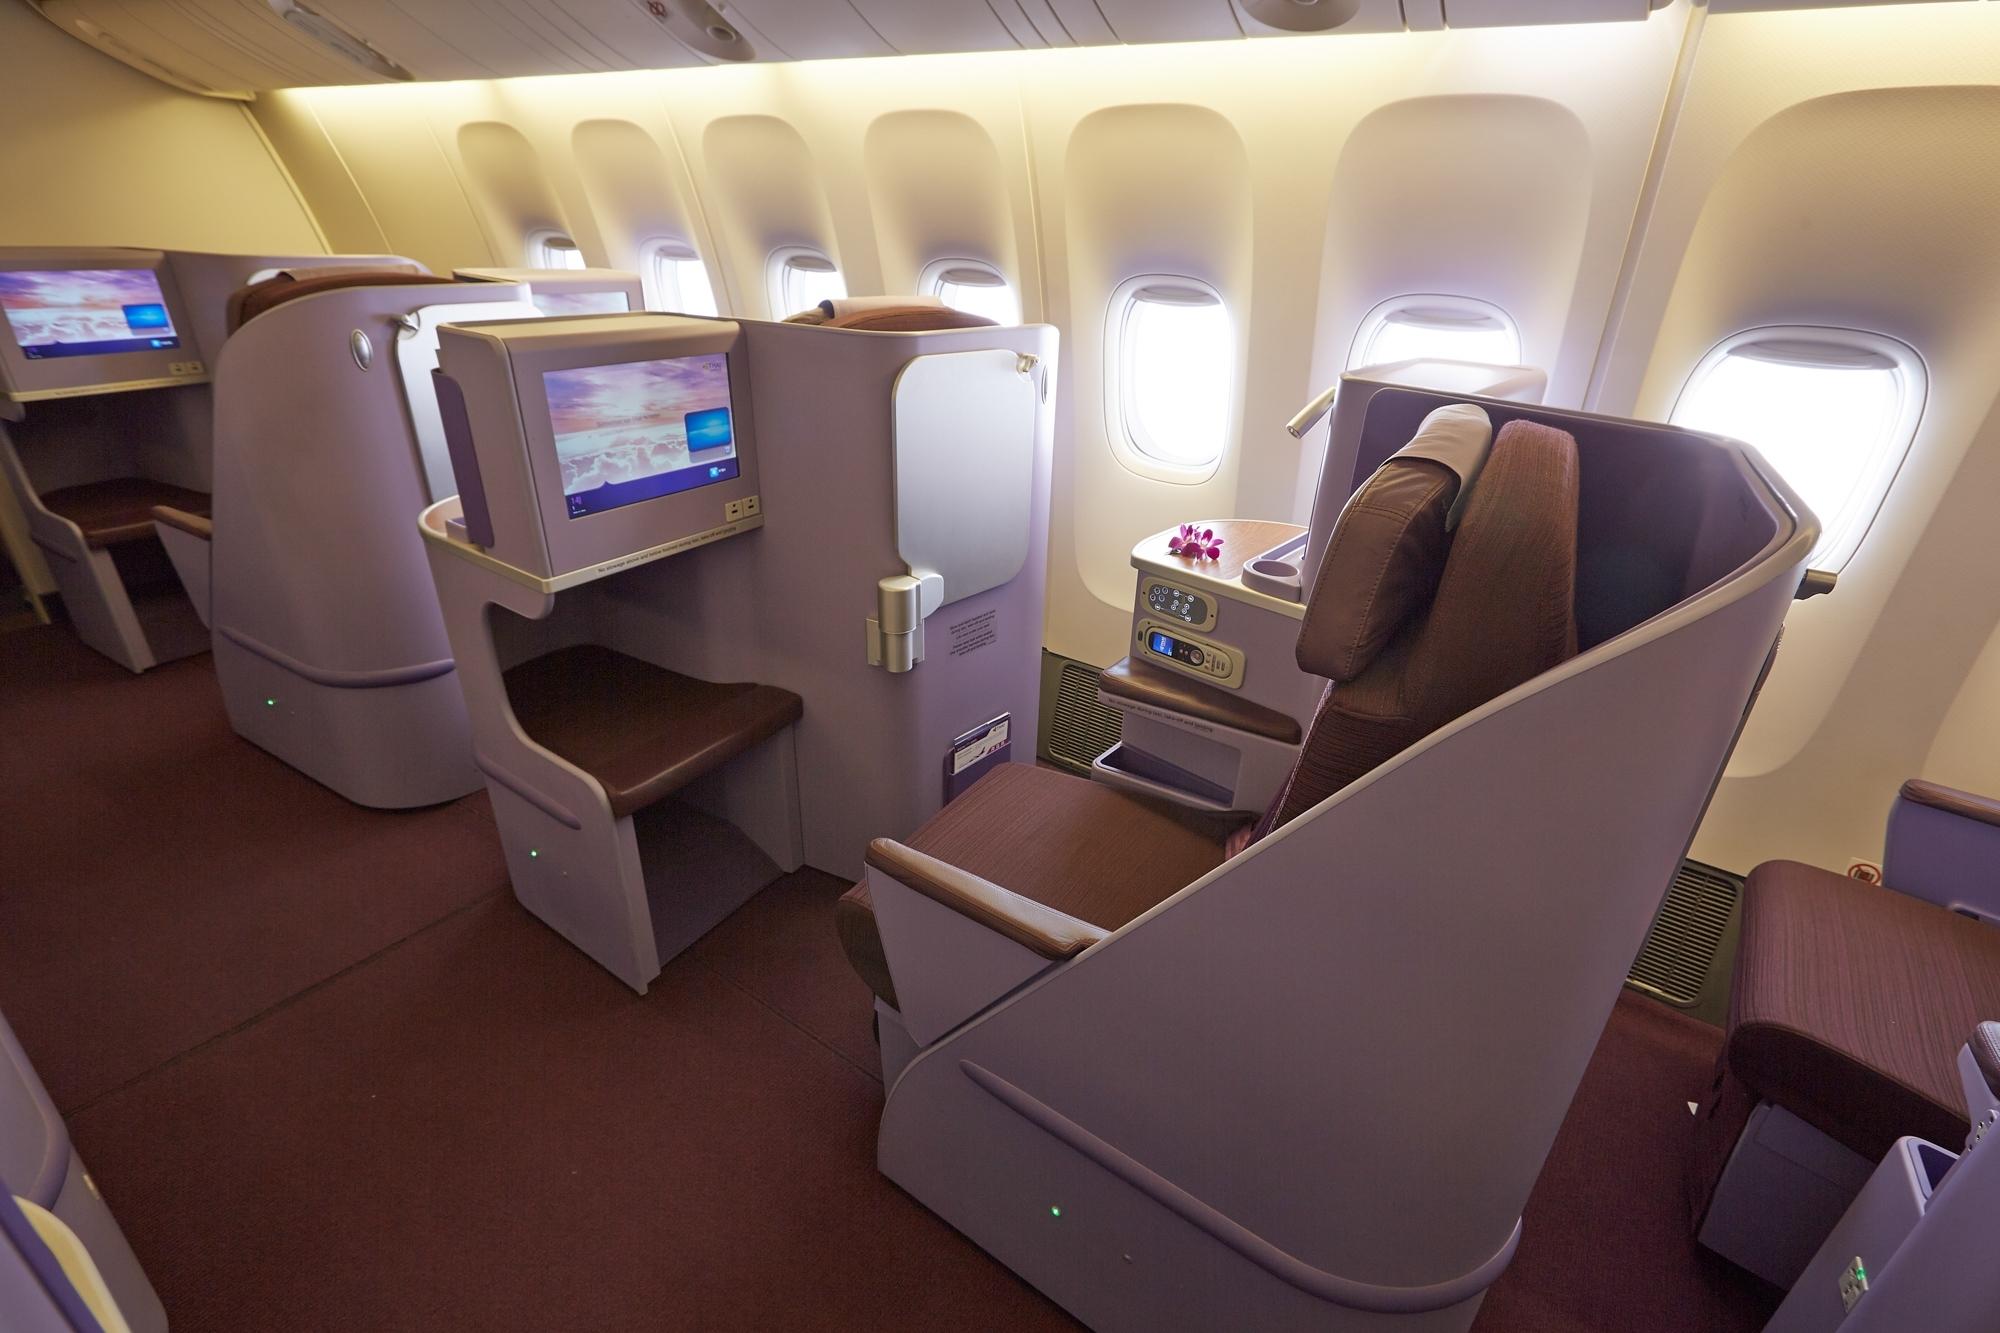 B777-300ER__Silk Class Seat_17_size_l.jpg